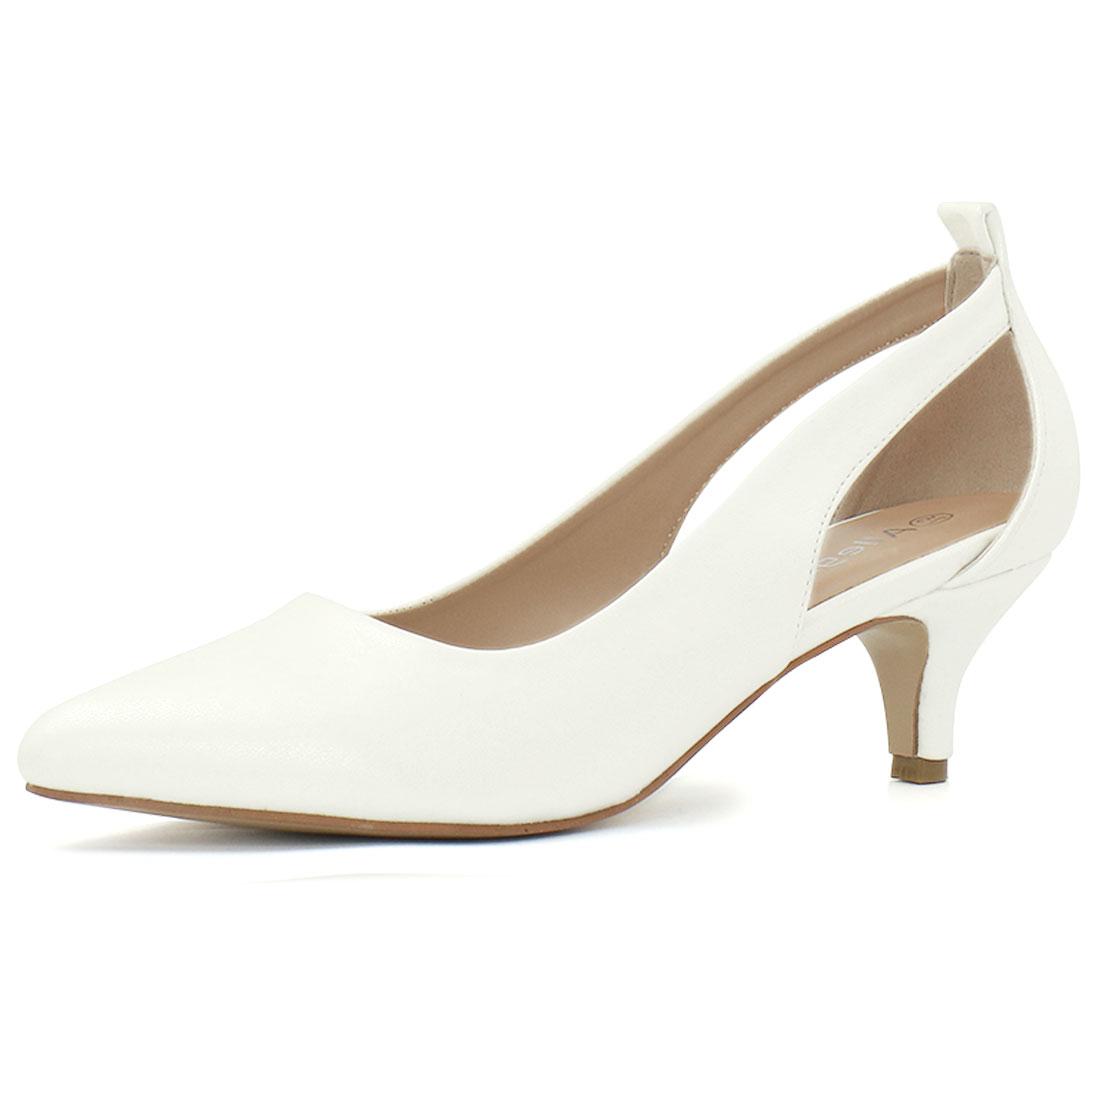 Allegra K Women's Cutout Sides Kitten Heel Pointed Toe Pumps White US 7.5